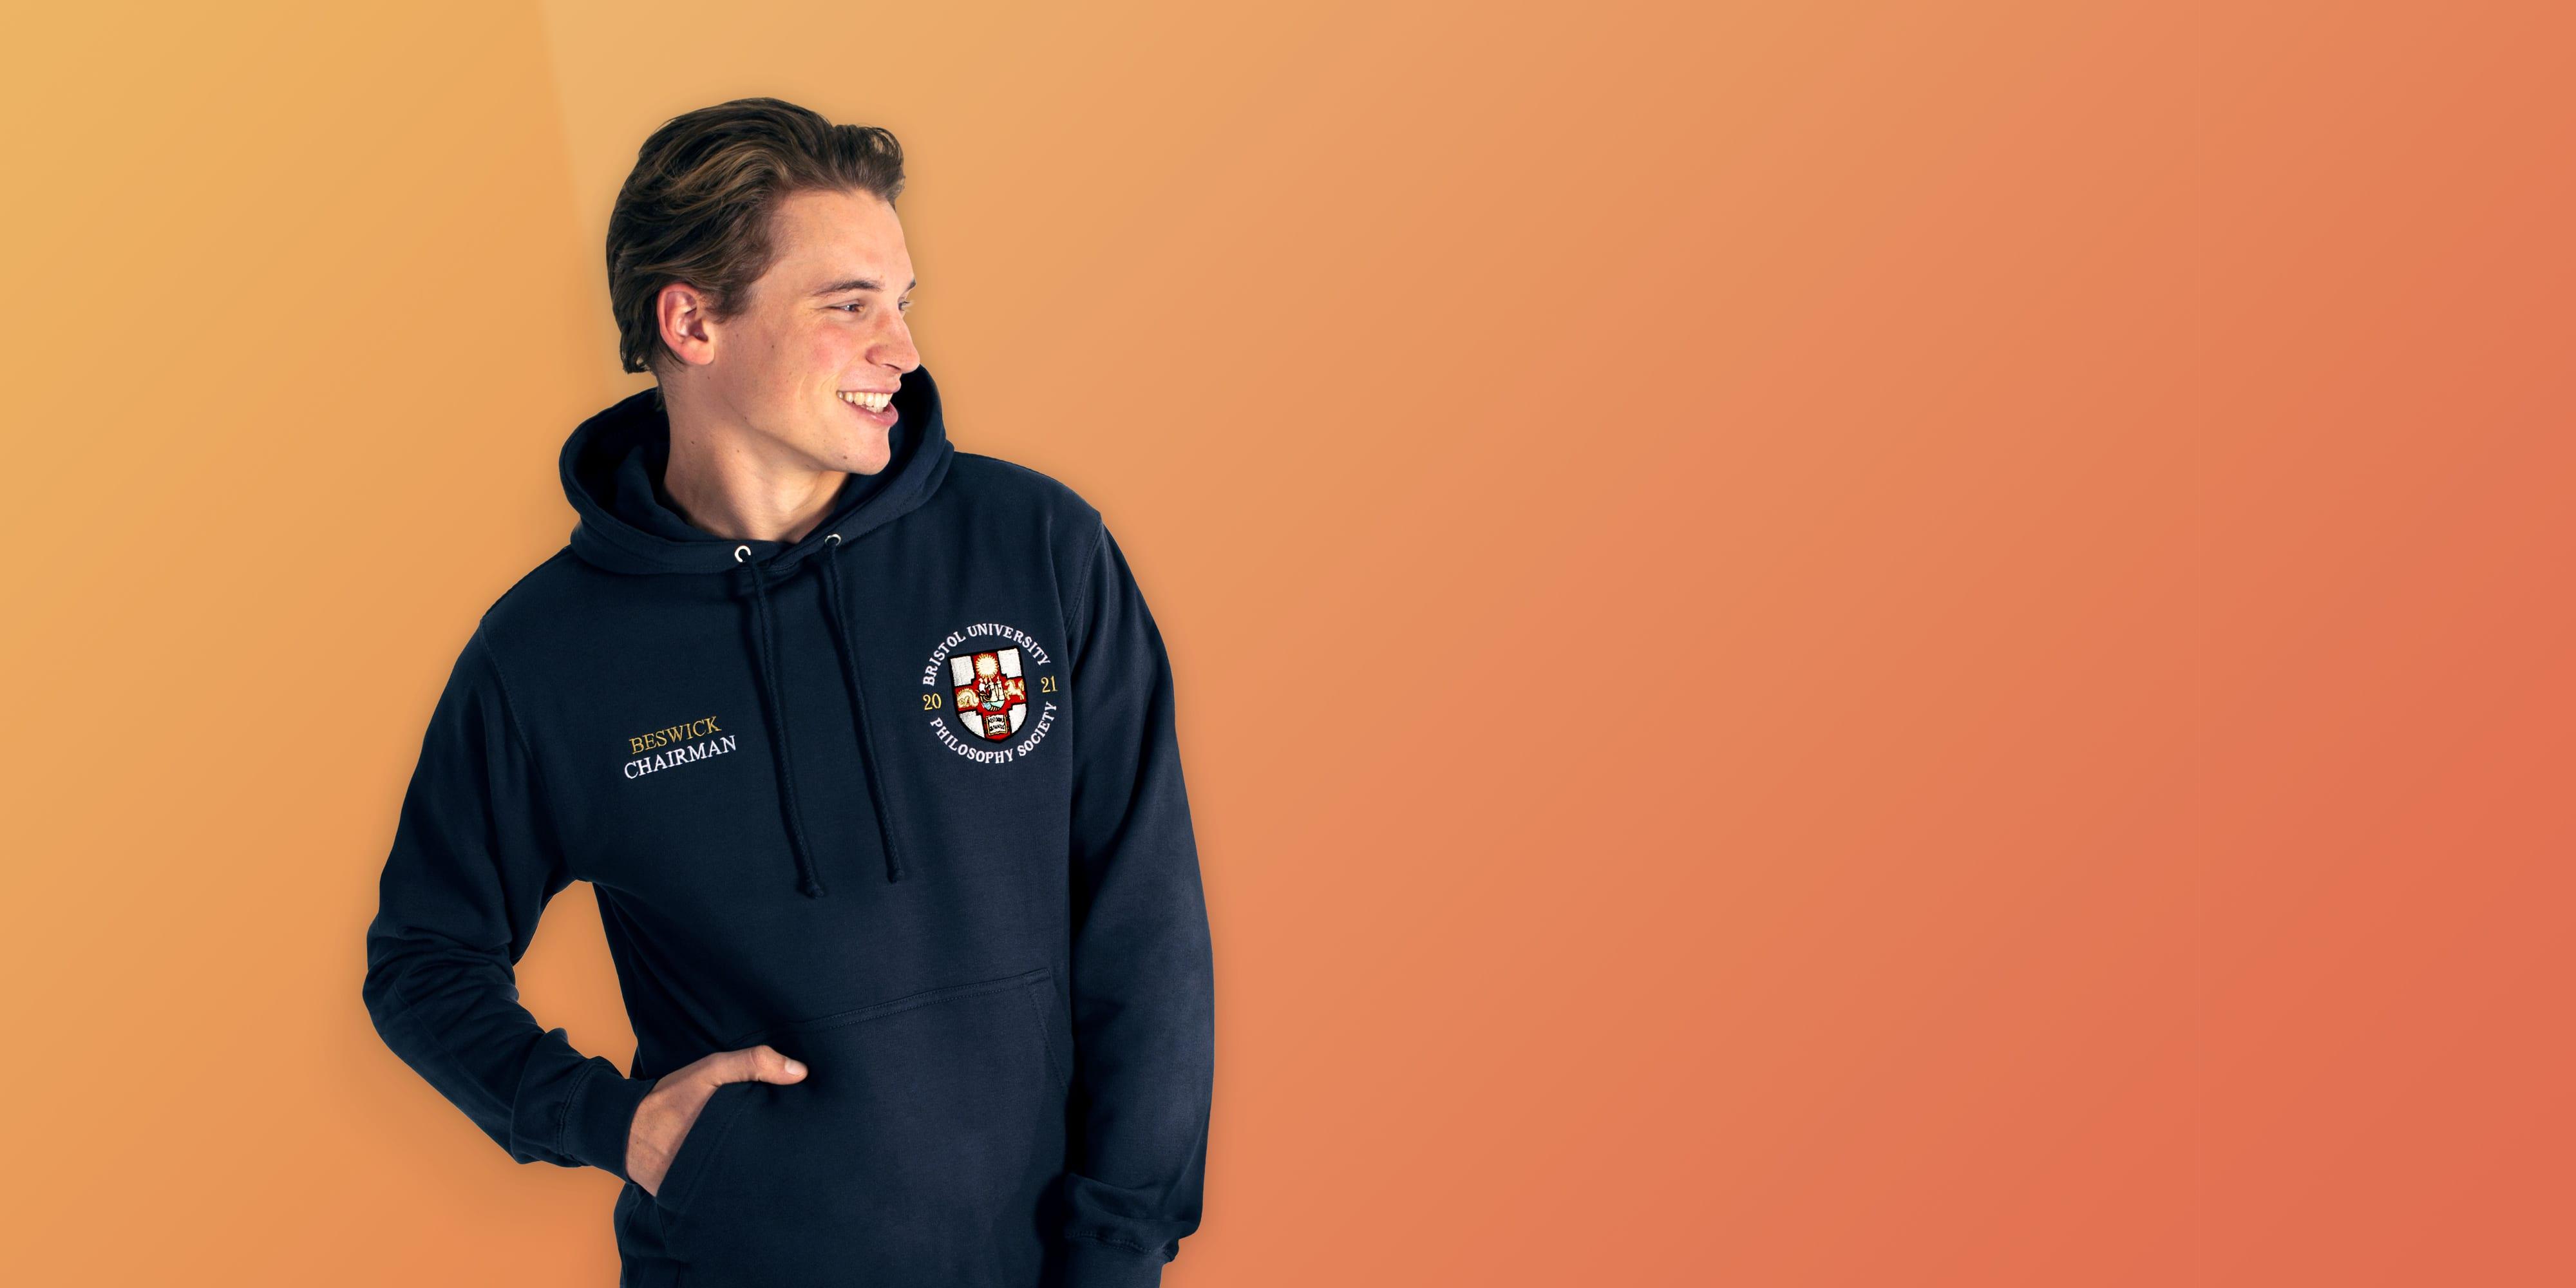 University logo hoodies for uni teams and societies